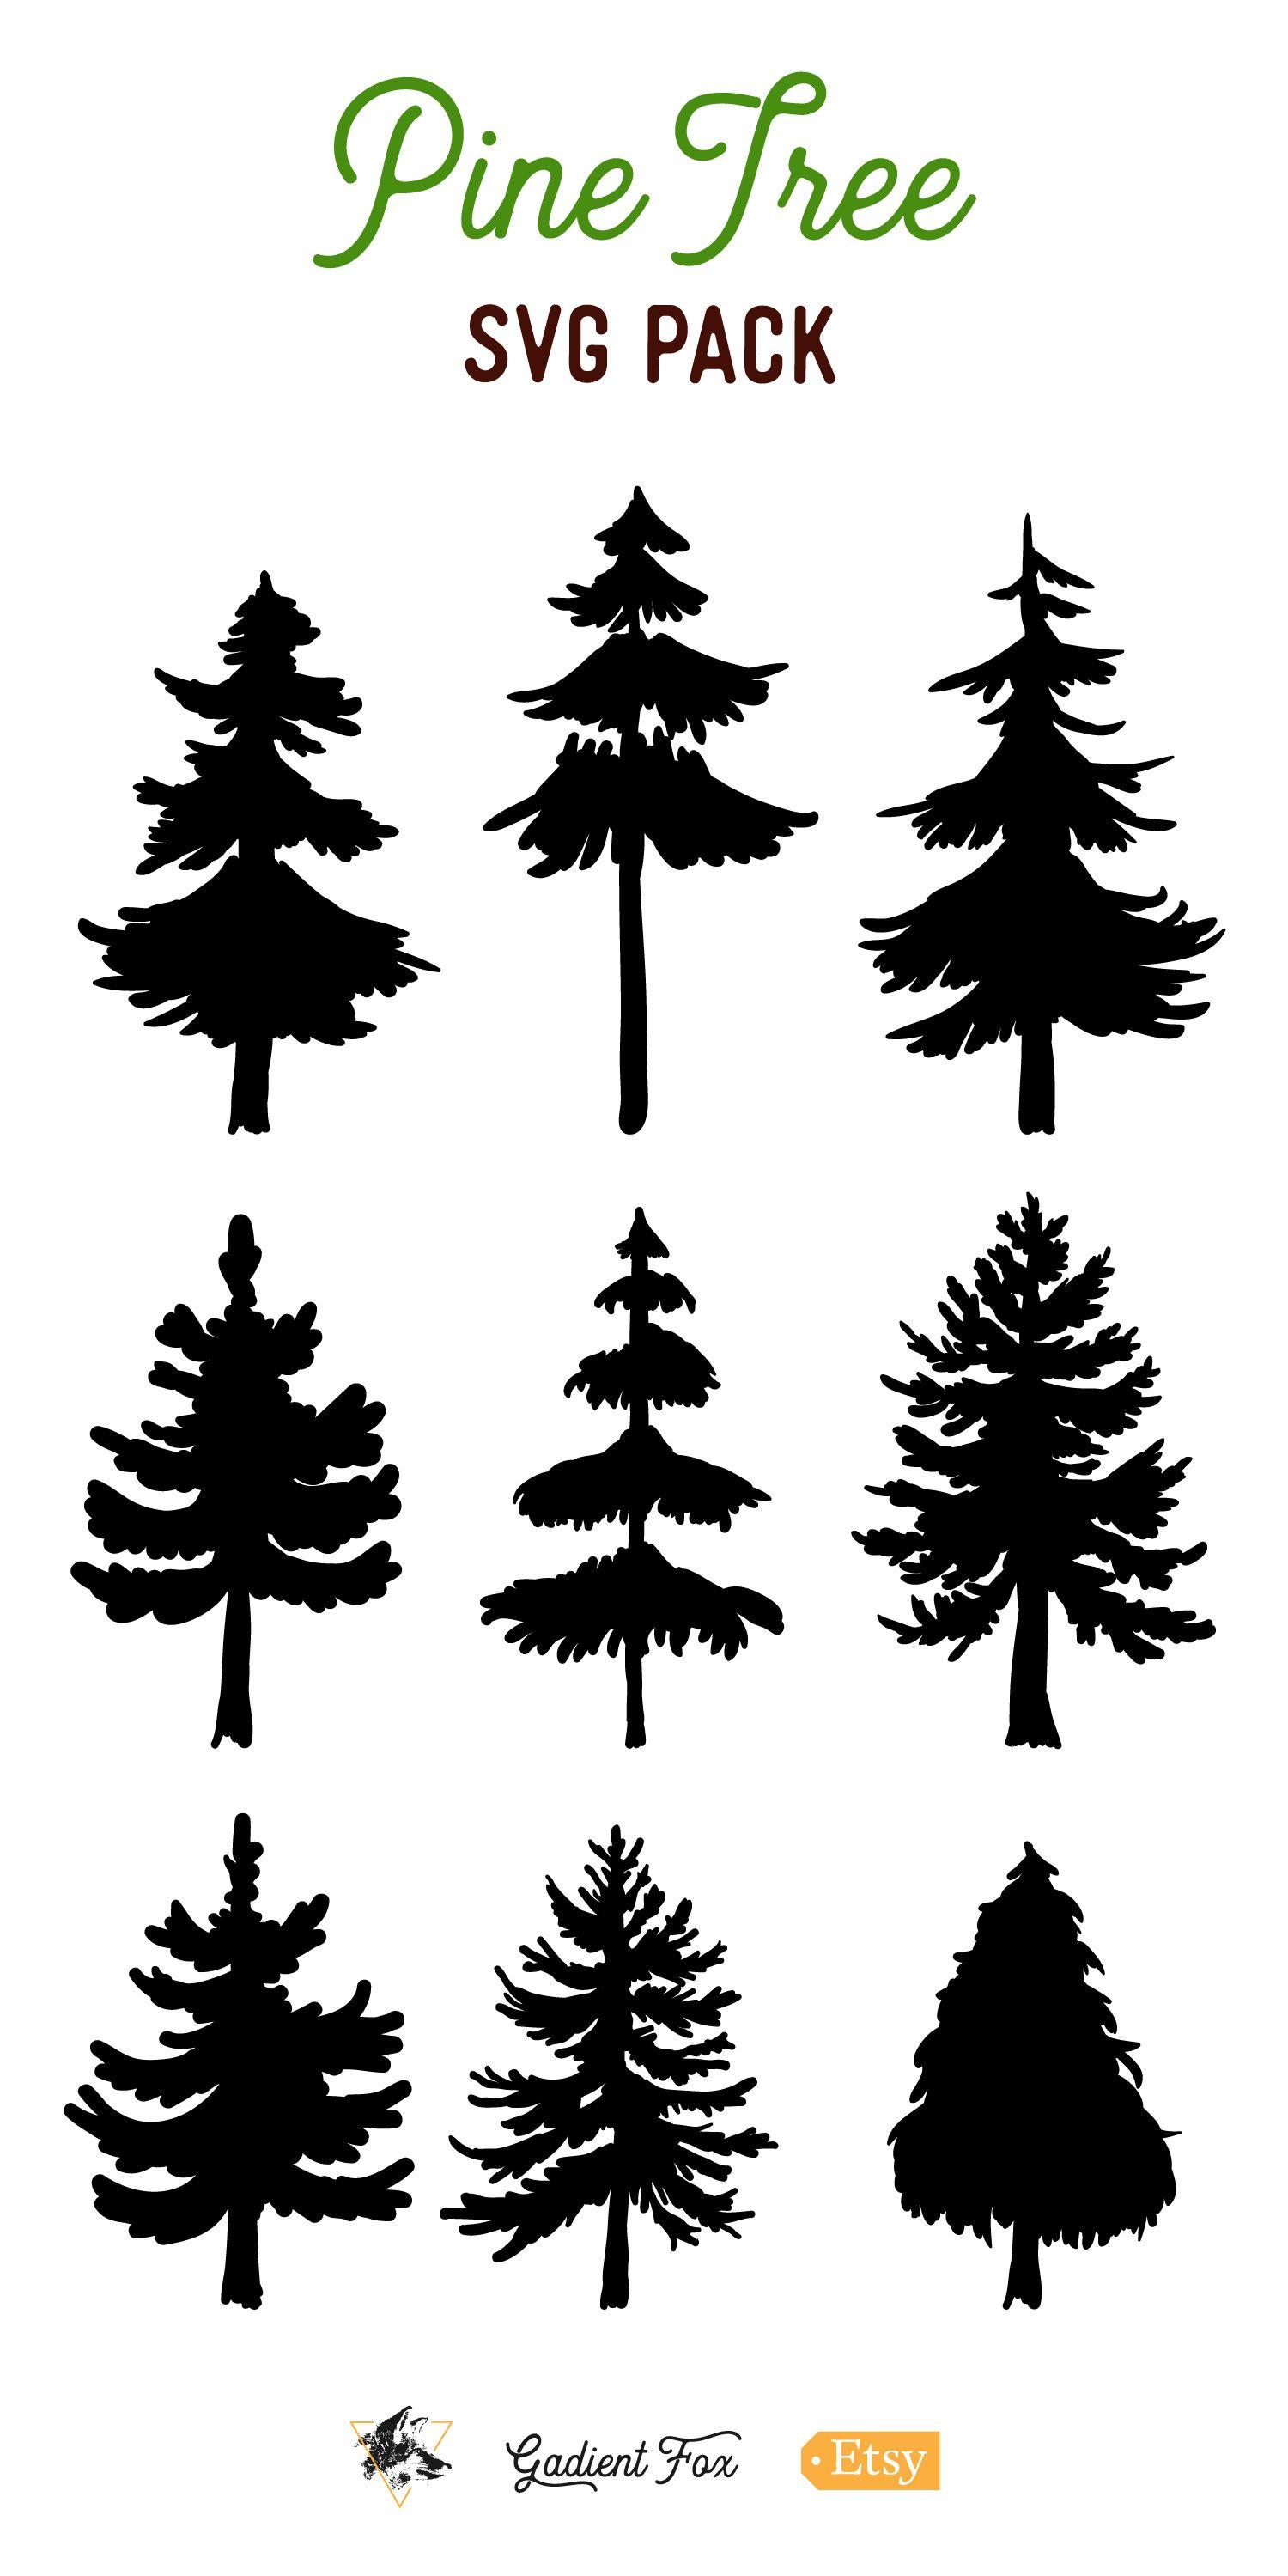 9 Vector Pine Tree Silhouette Illustrations.